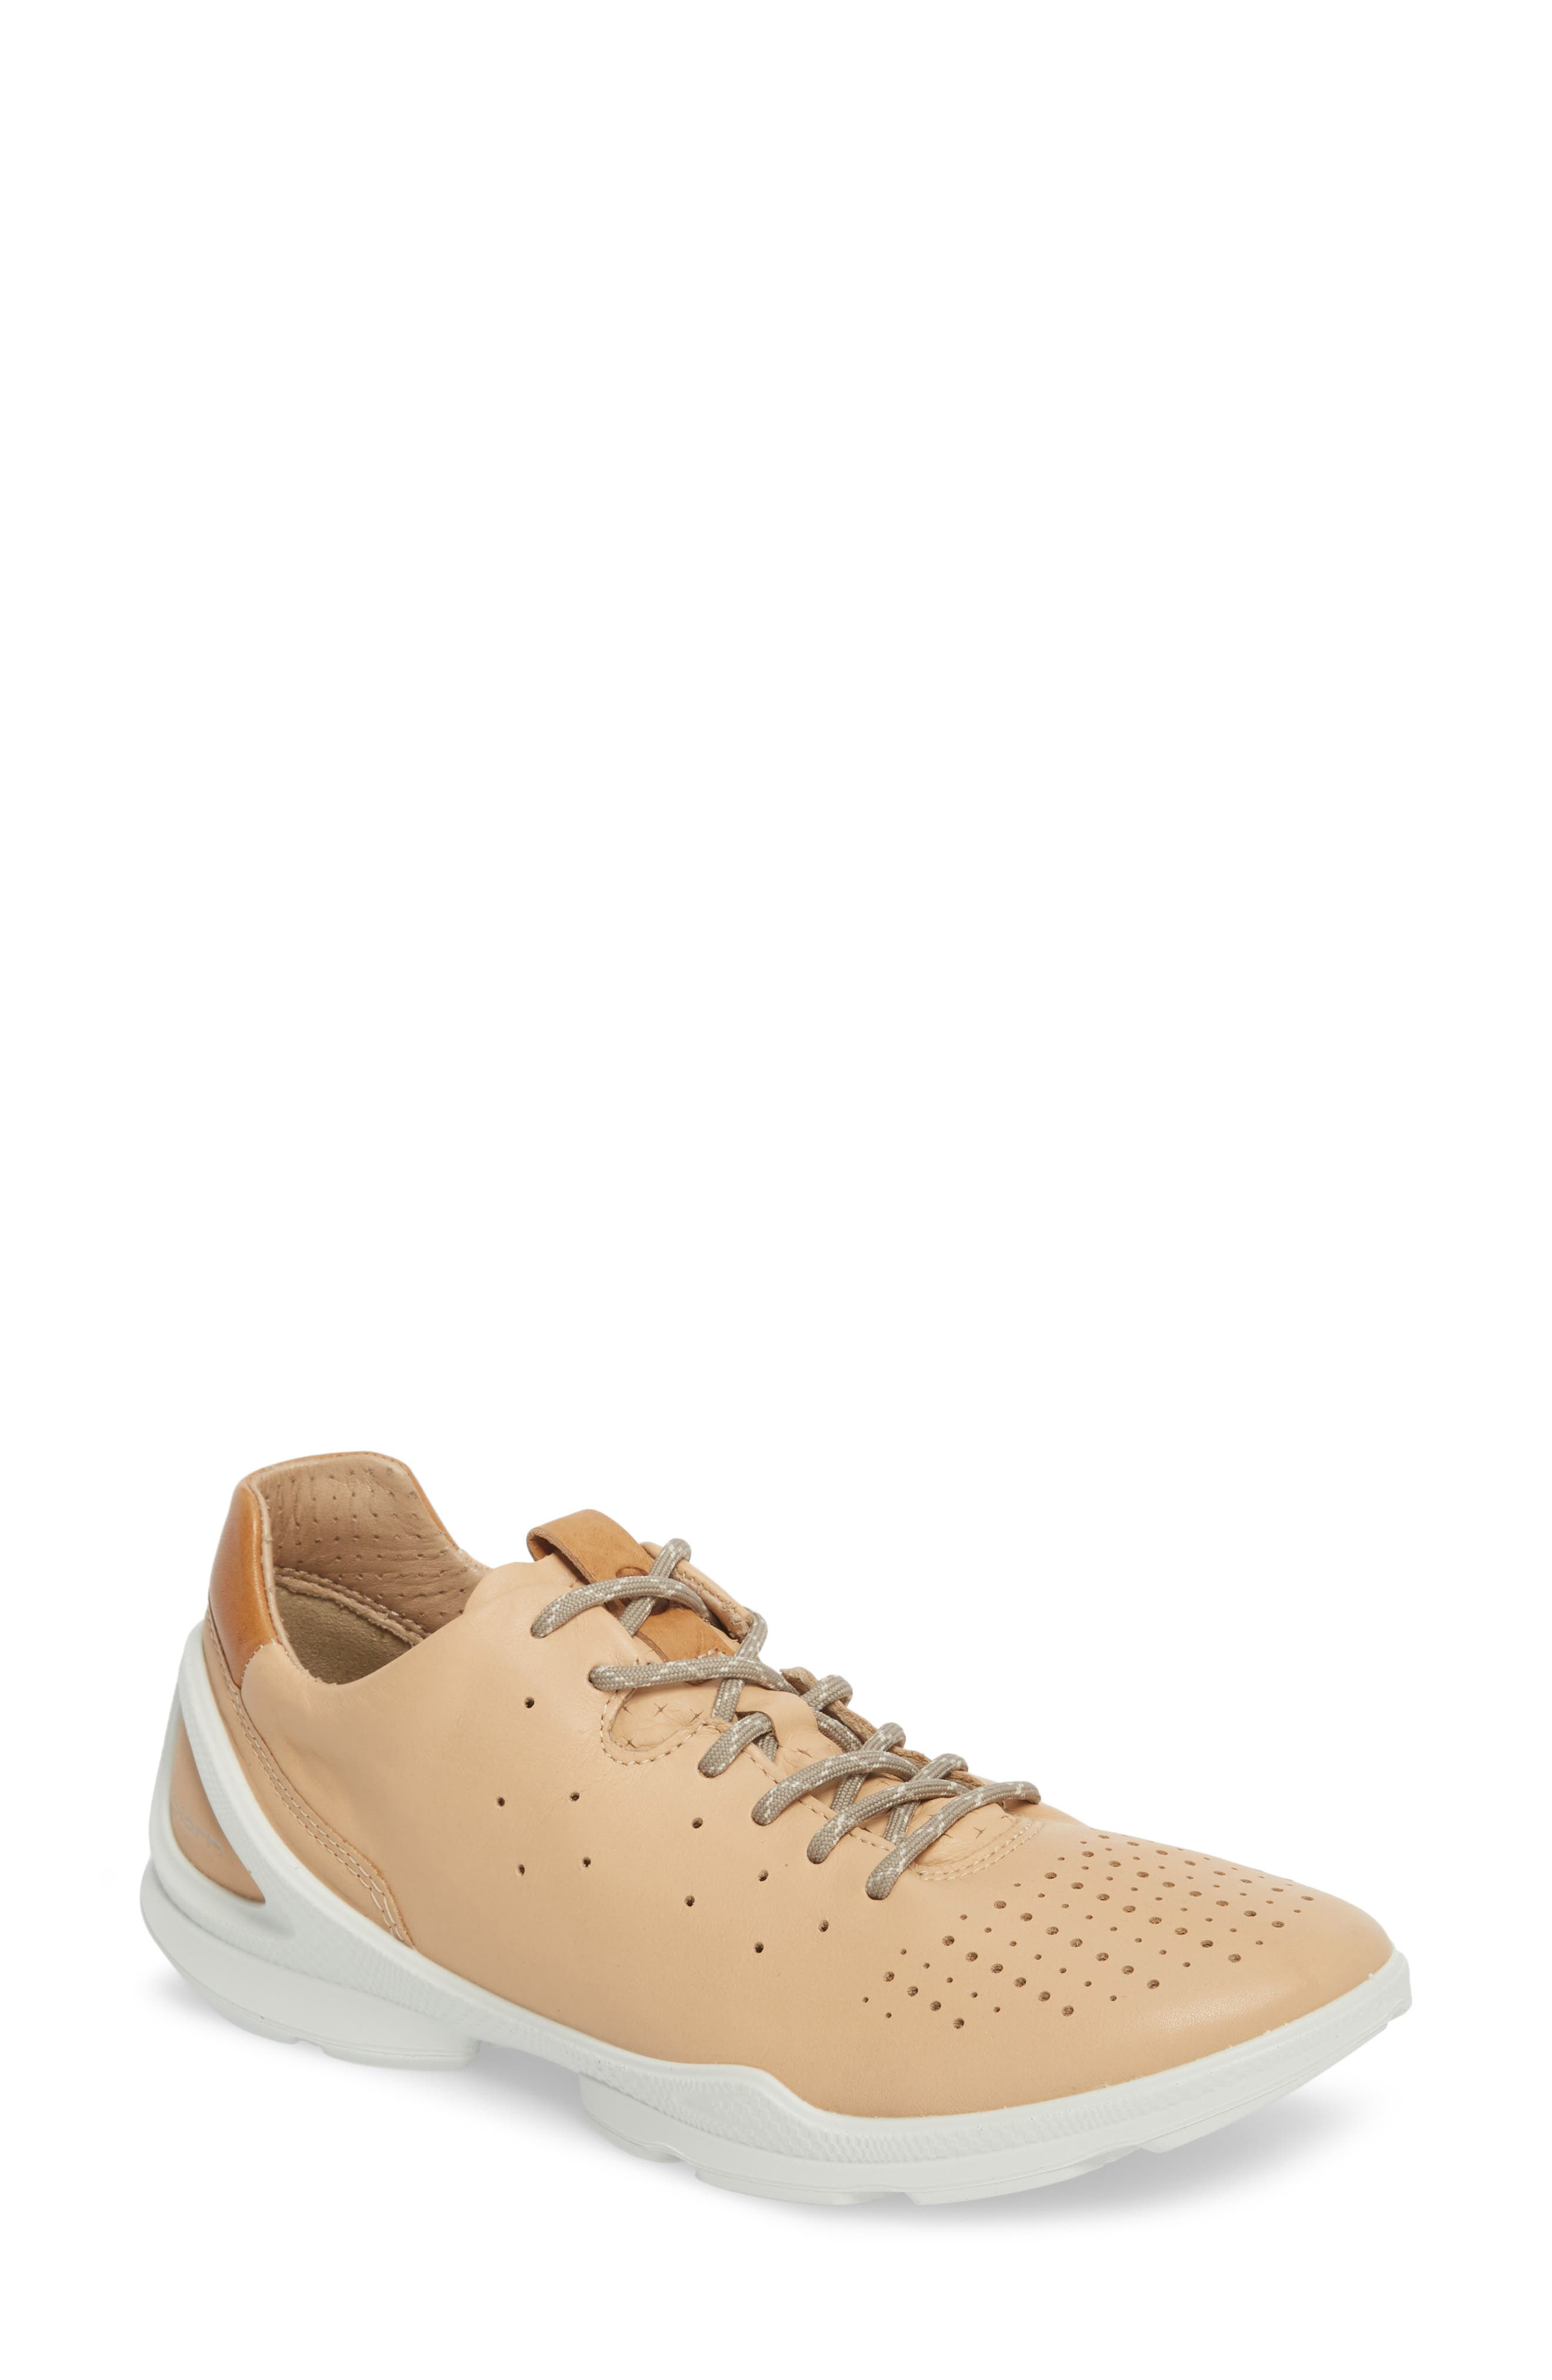 Biom Street Sneaker,                             Main thumbnail 1, color,                             024